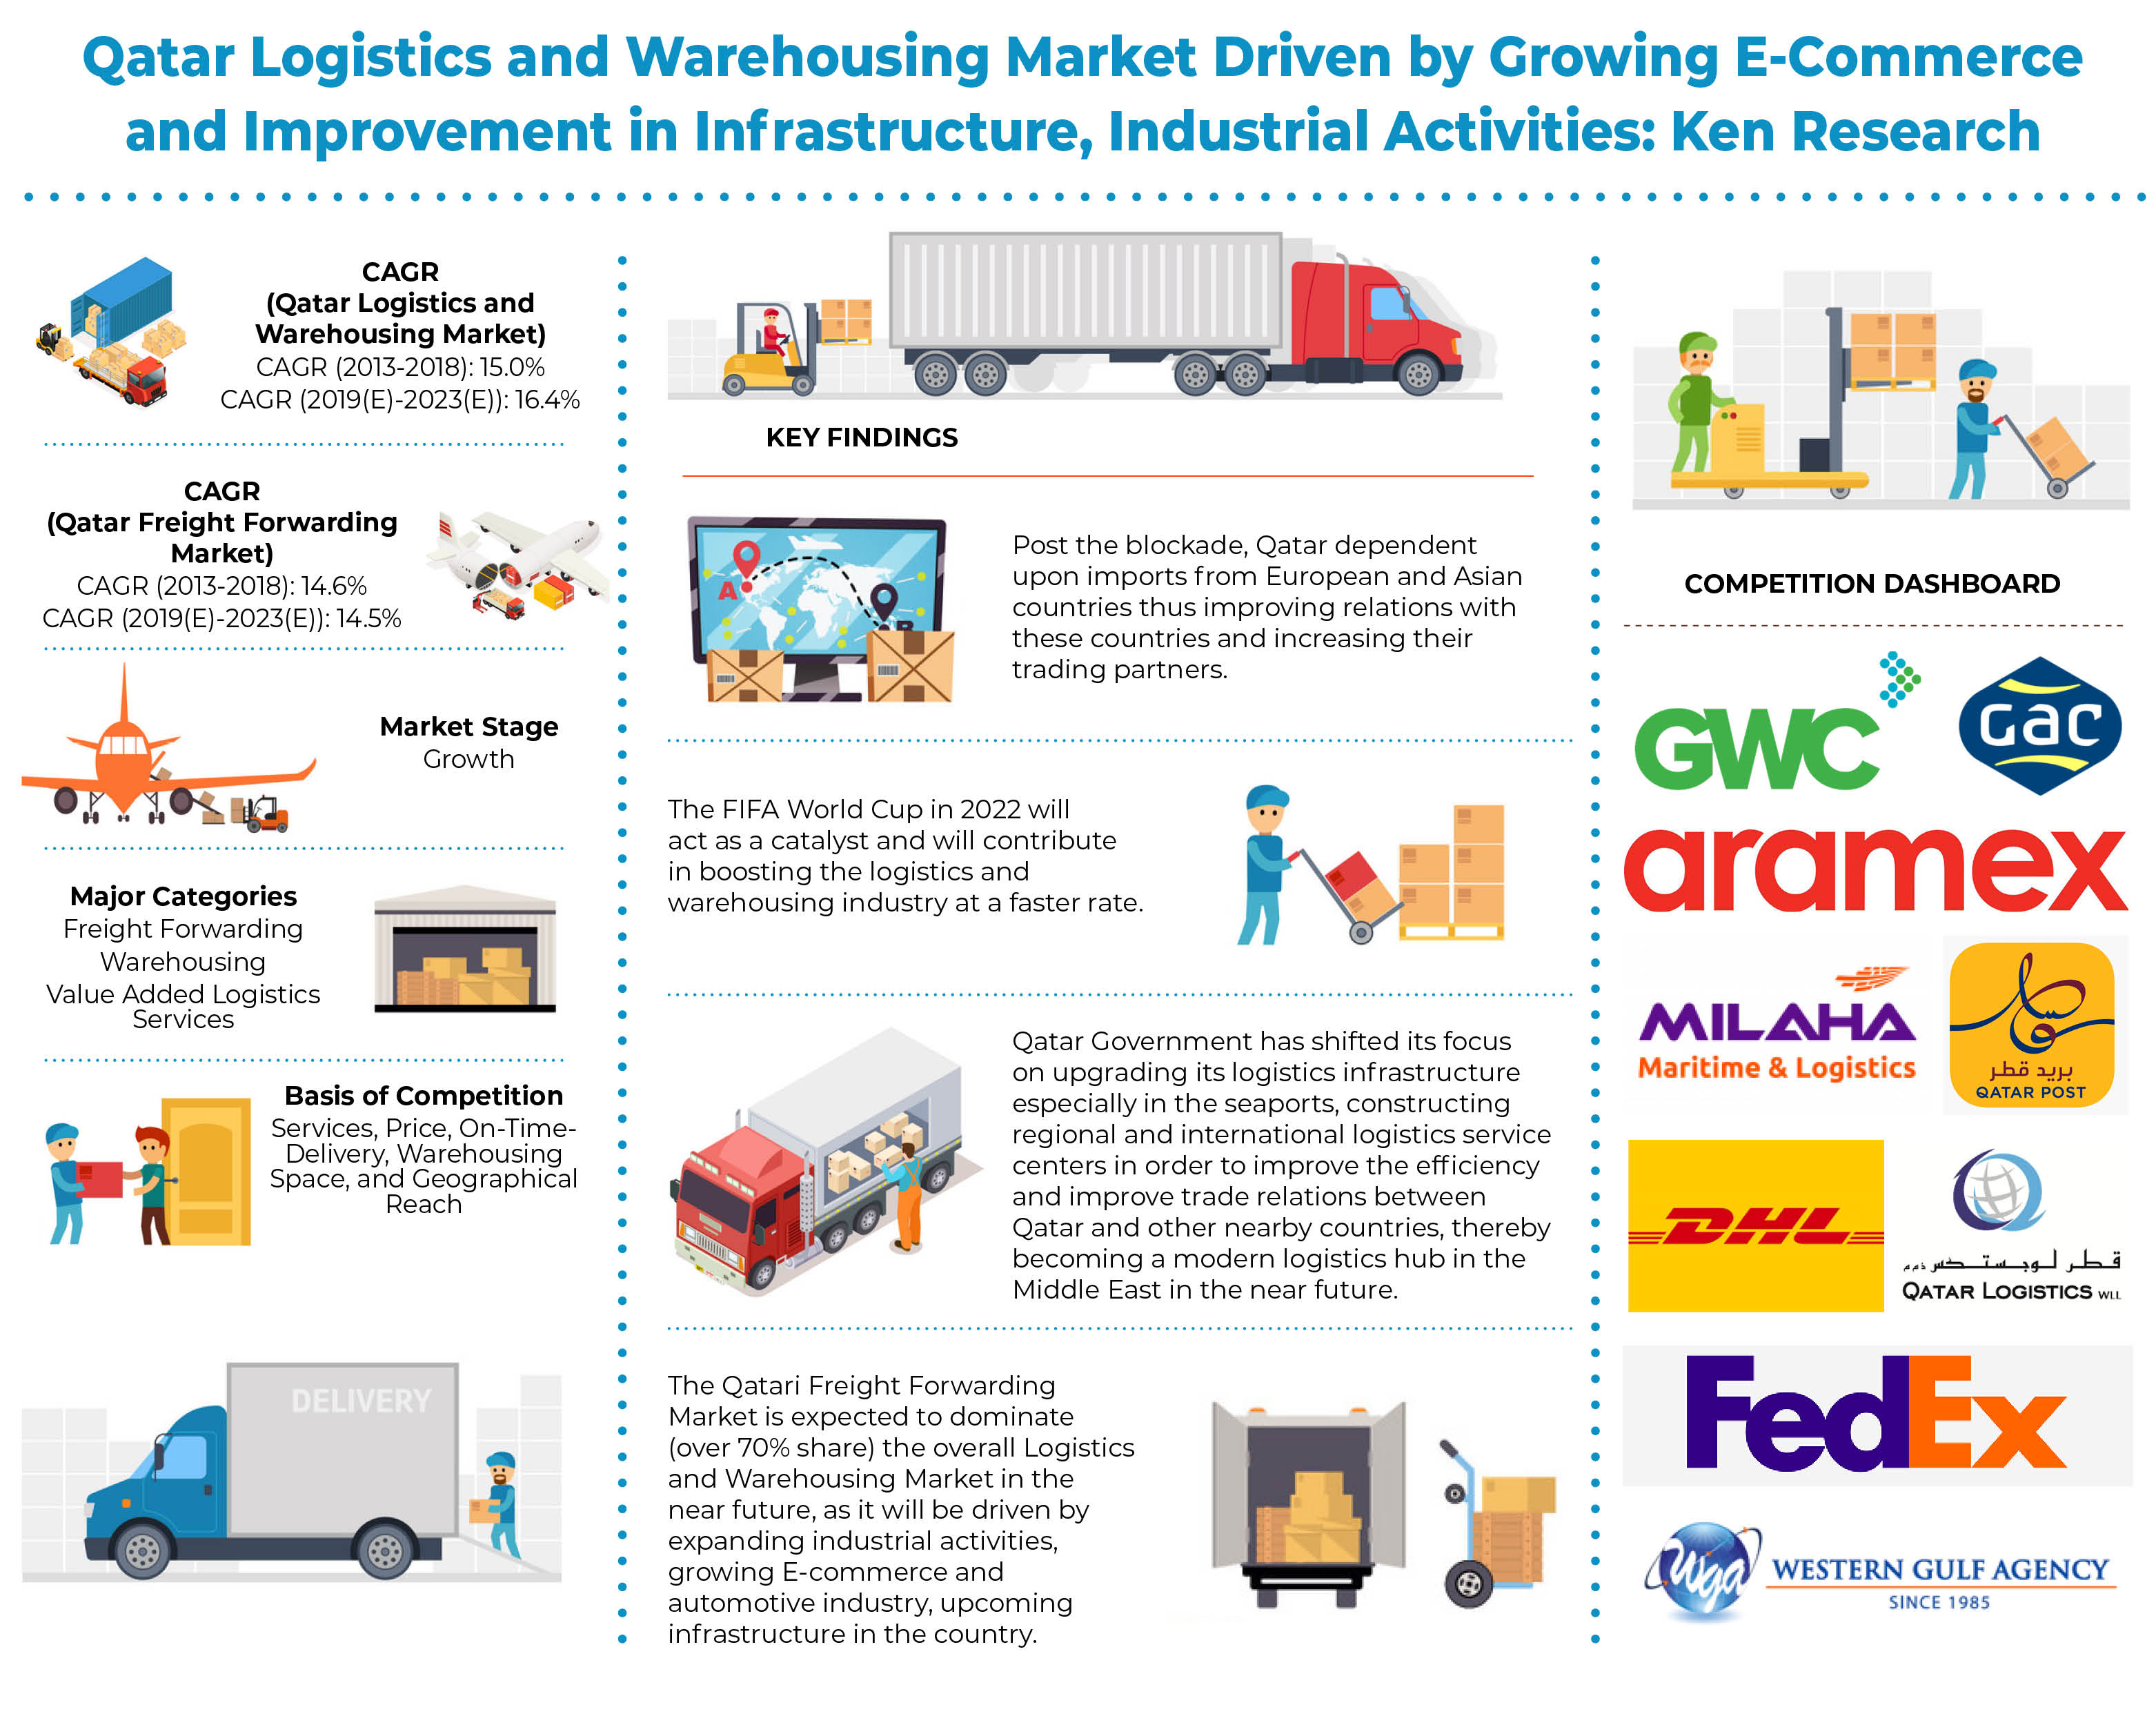 Qatar Logistics and Warehousing Market